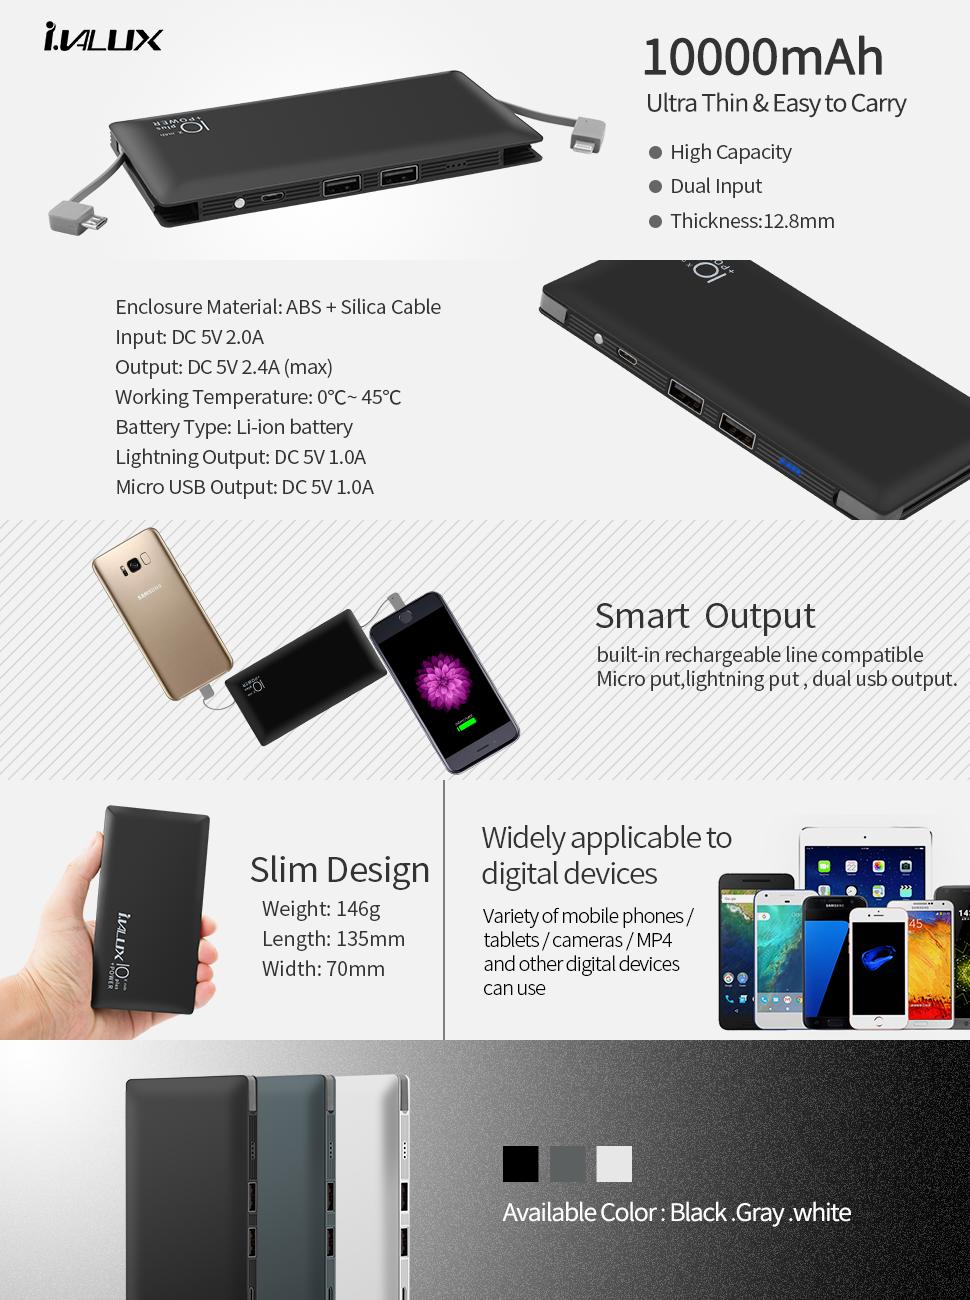 Product Description Amazoncom iVALUX 10000mAh Super Slim